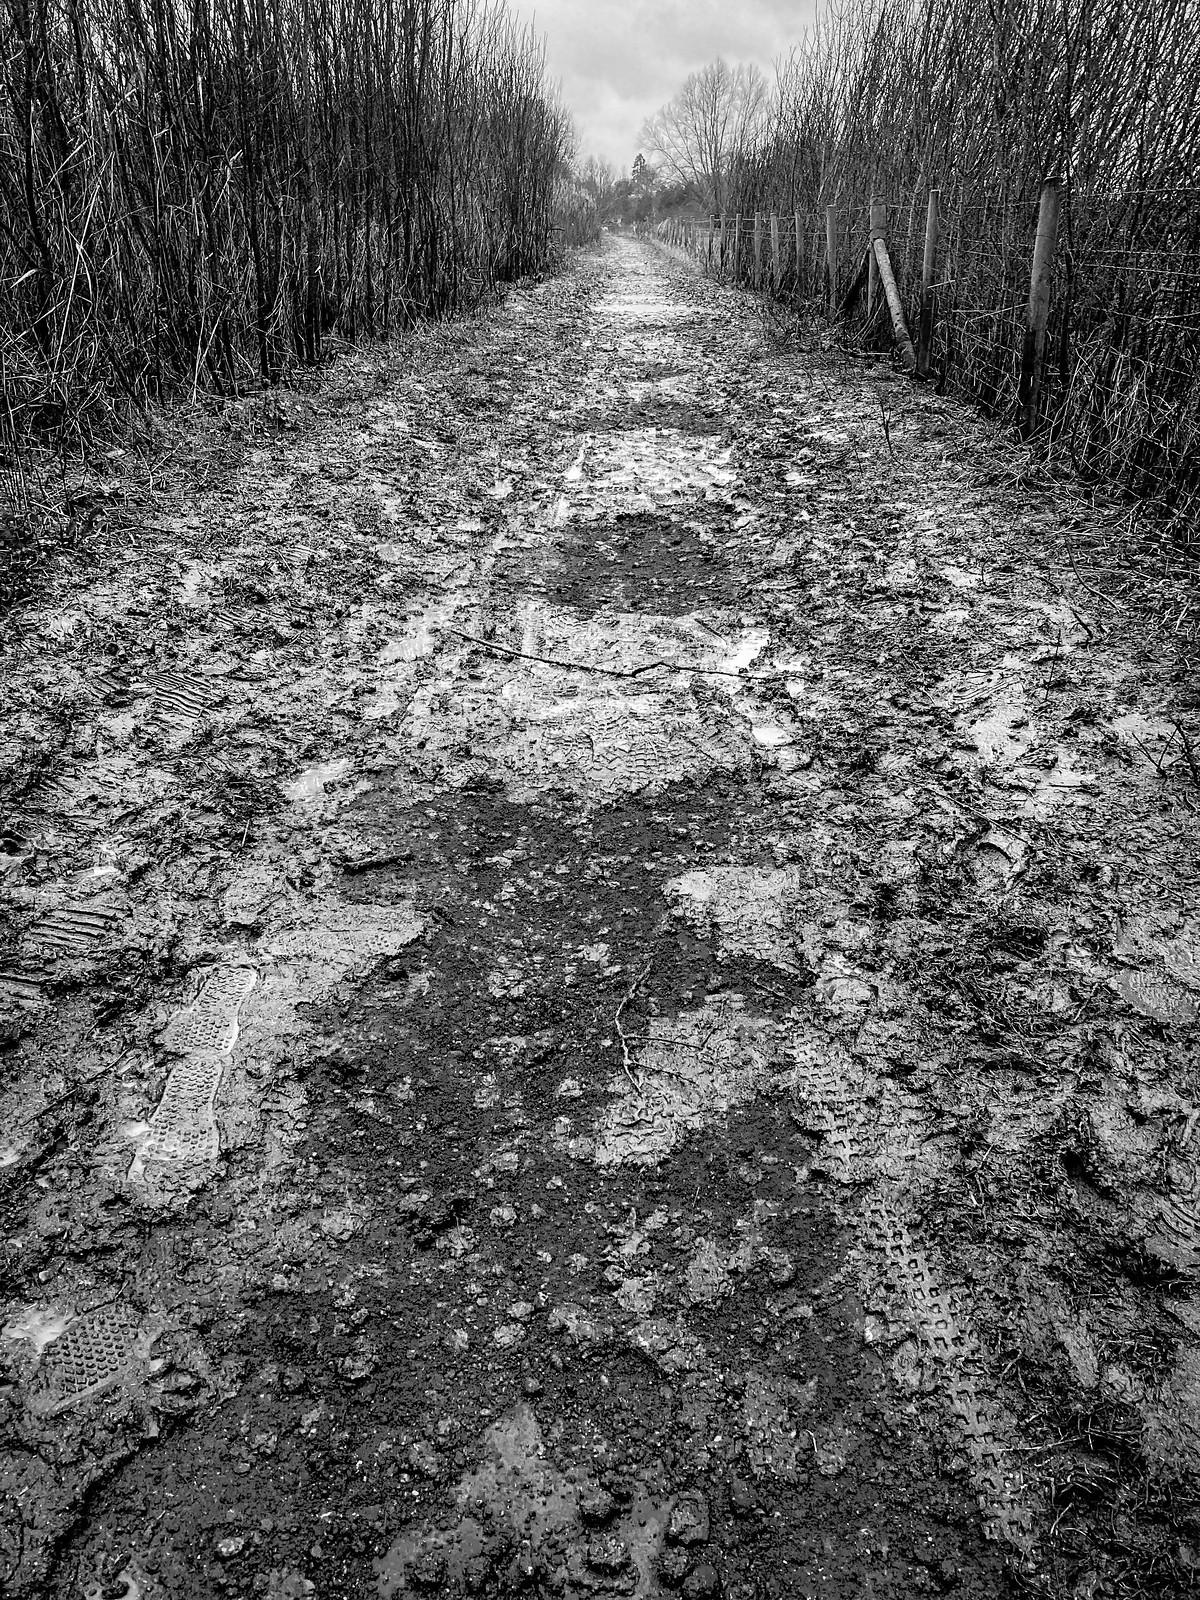 The Thames Path between Wallingford & Benson